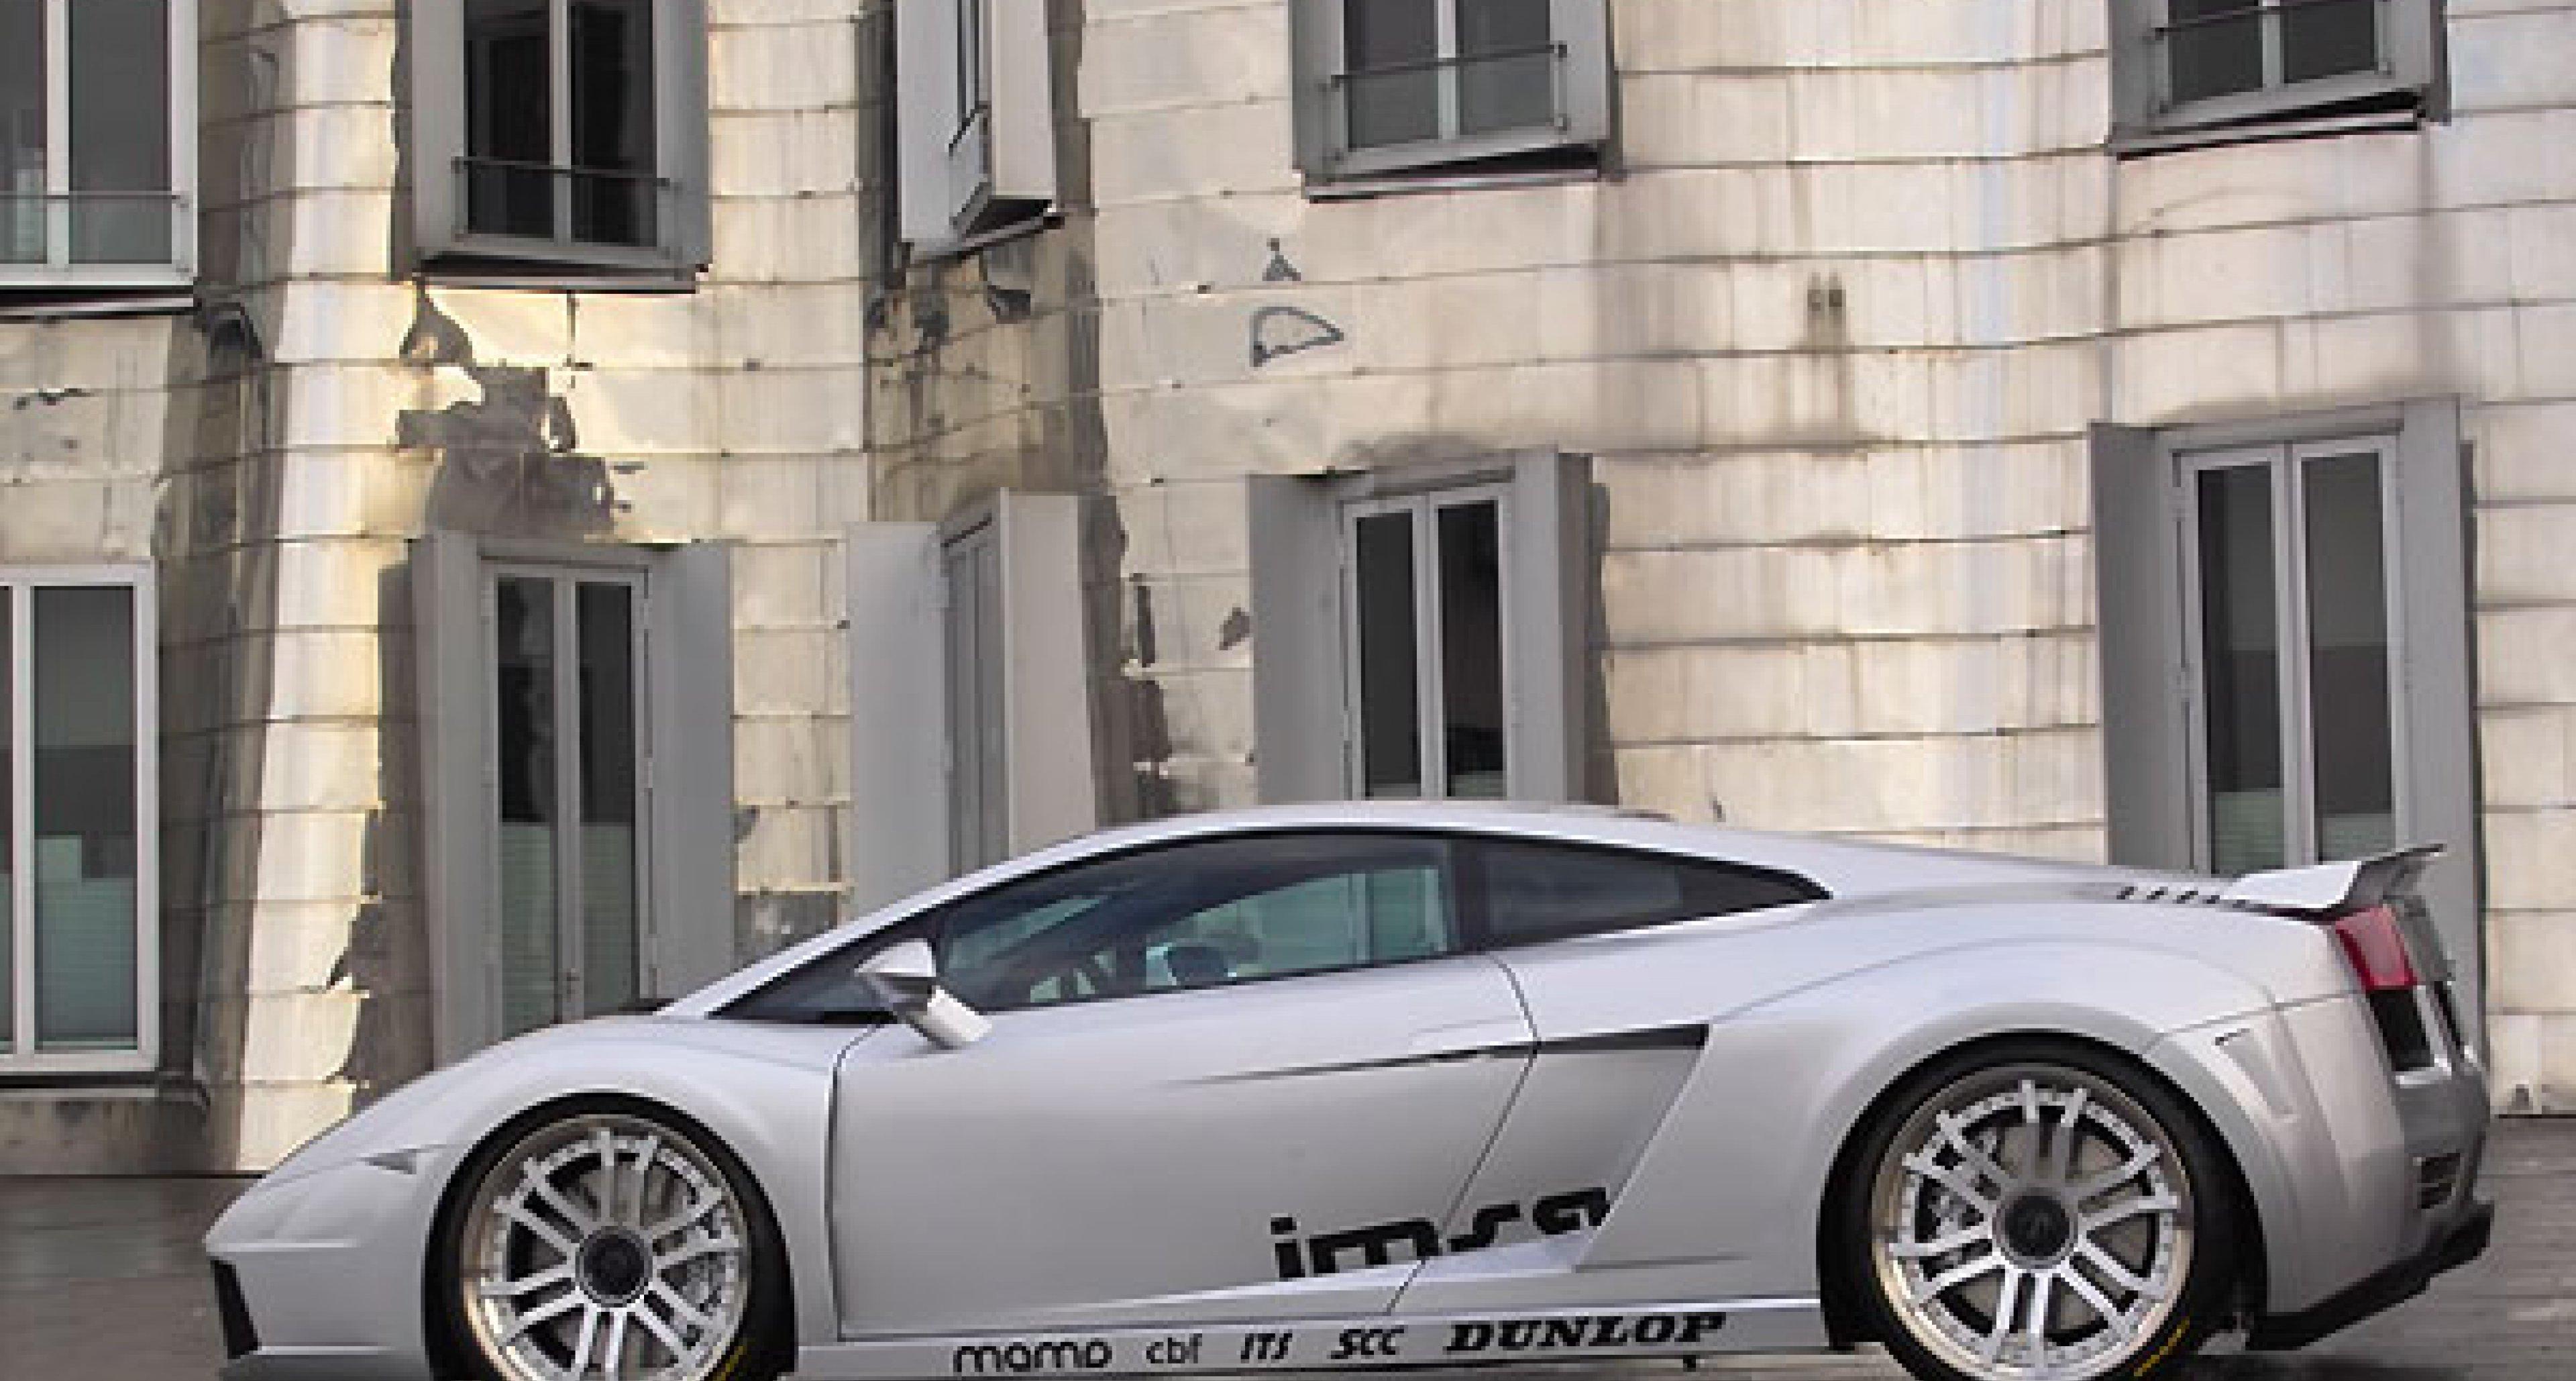 Imsa Gallardo GTV – Geheimwaffe